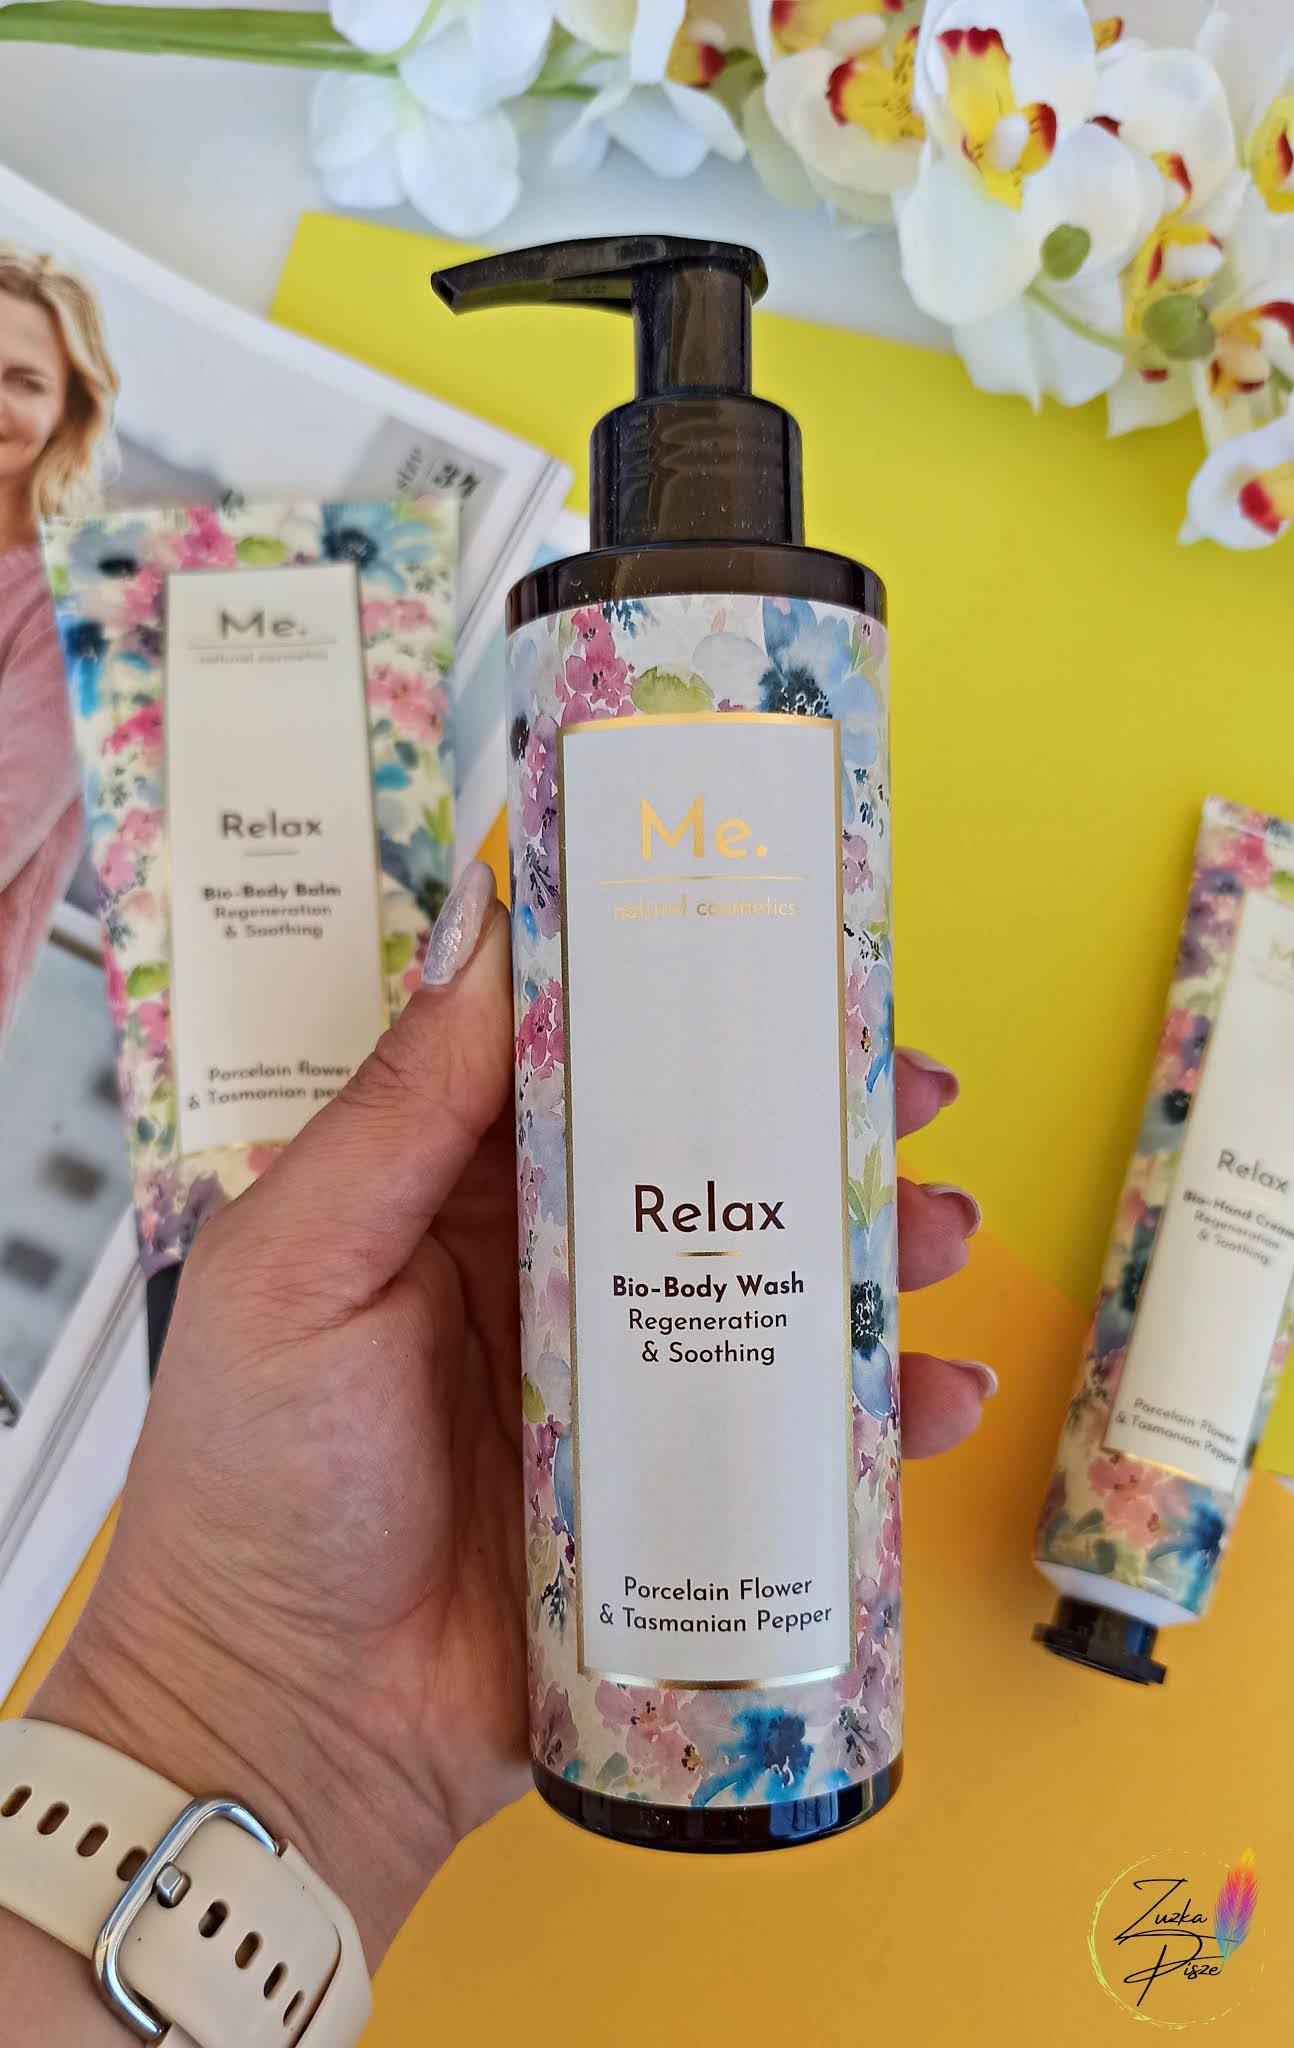 Me. Rytuał Relax Porcelain flower & Tasmanian pepper Cosmetics Box Set